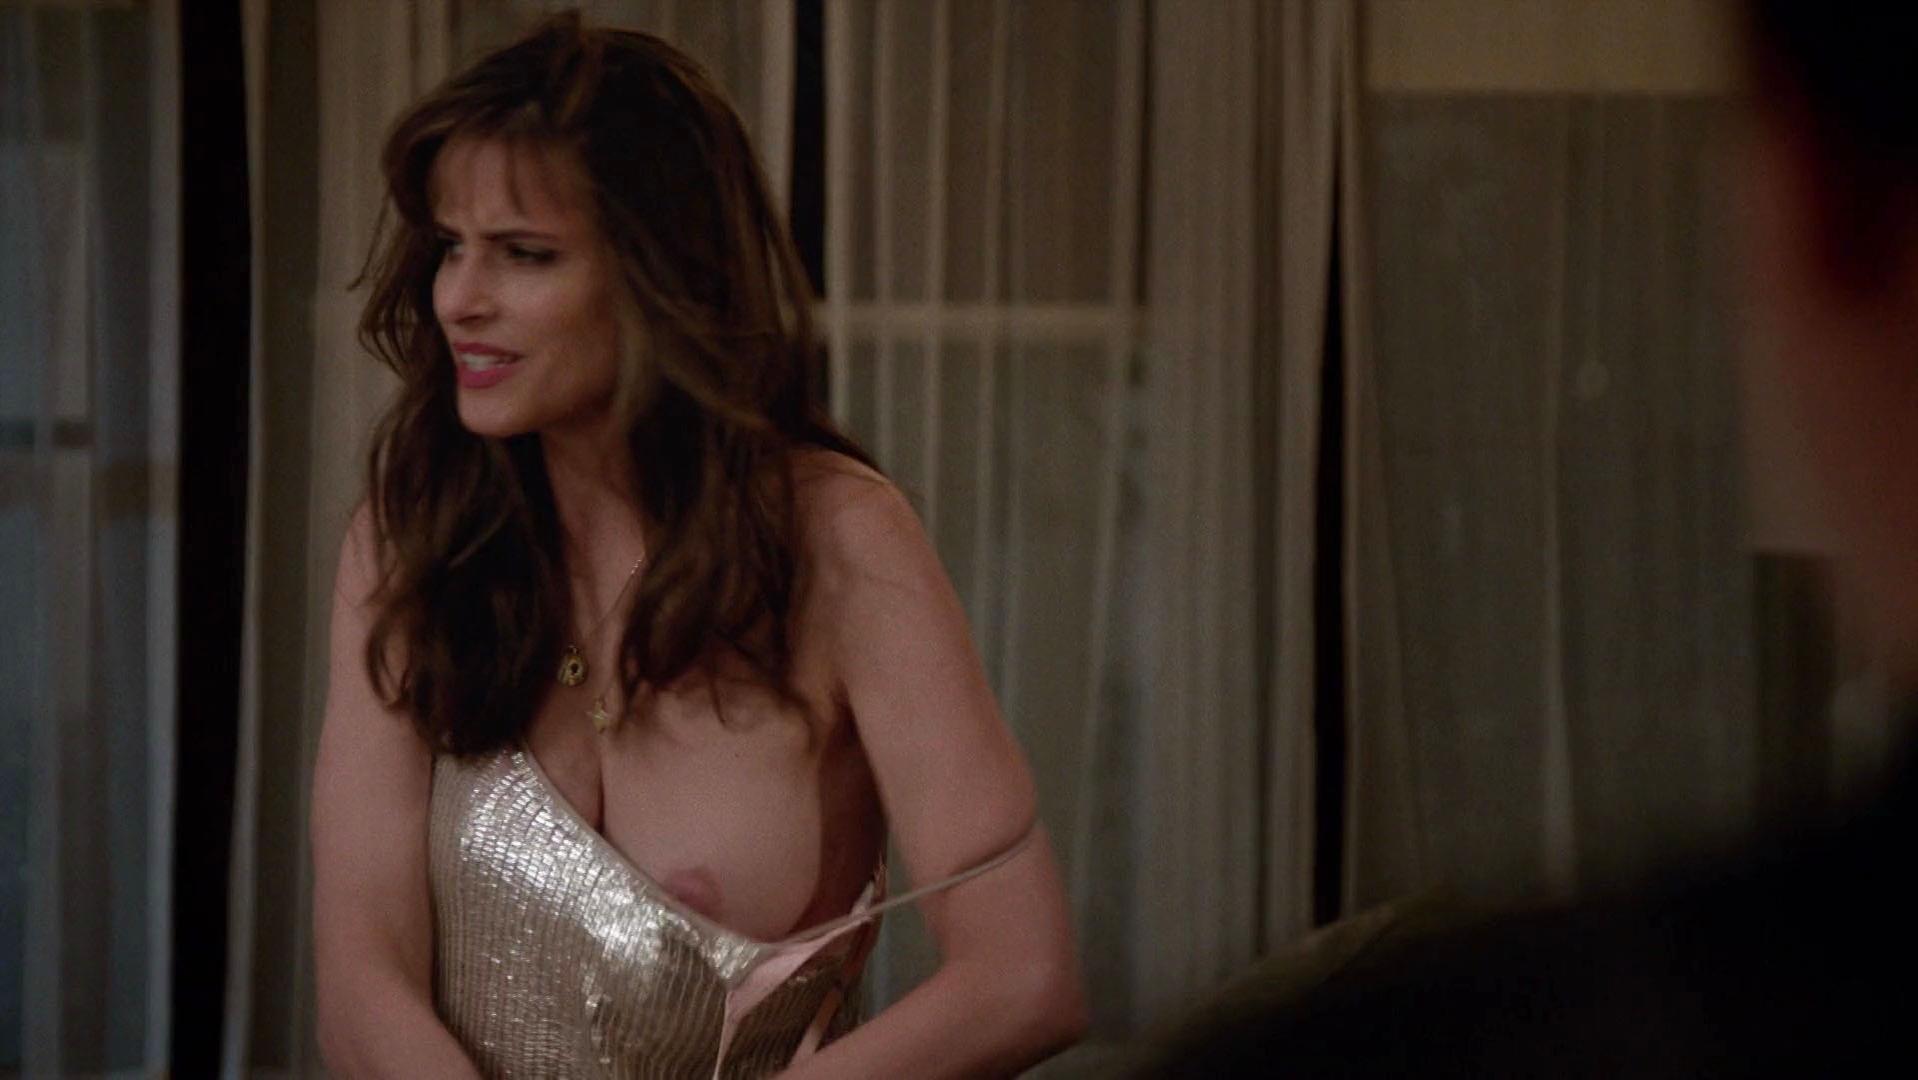 Nude Video Celebs  Amanda Peet Nude - Togetherness S02E02 -9071